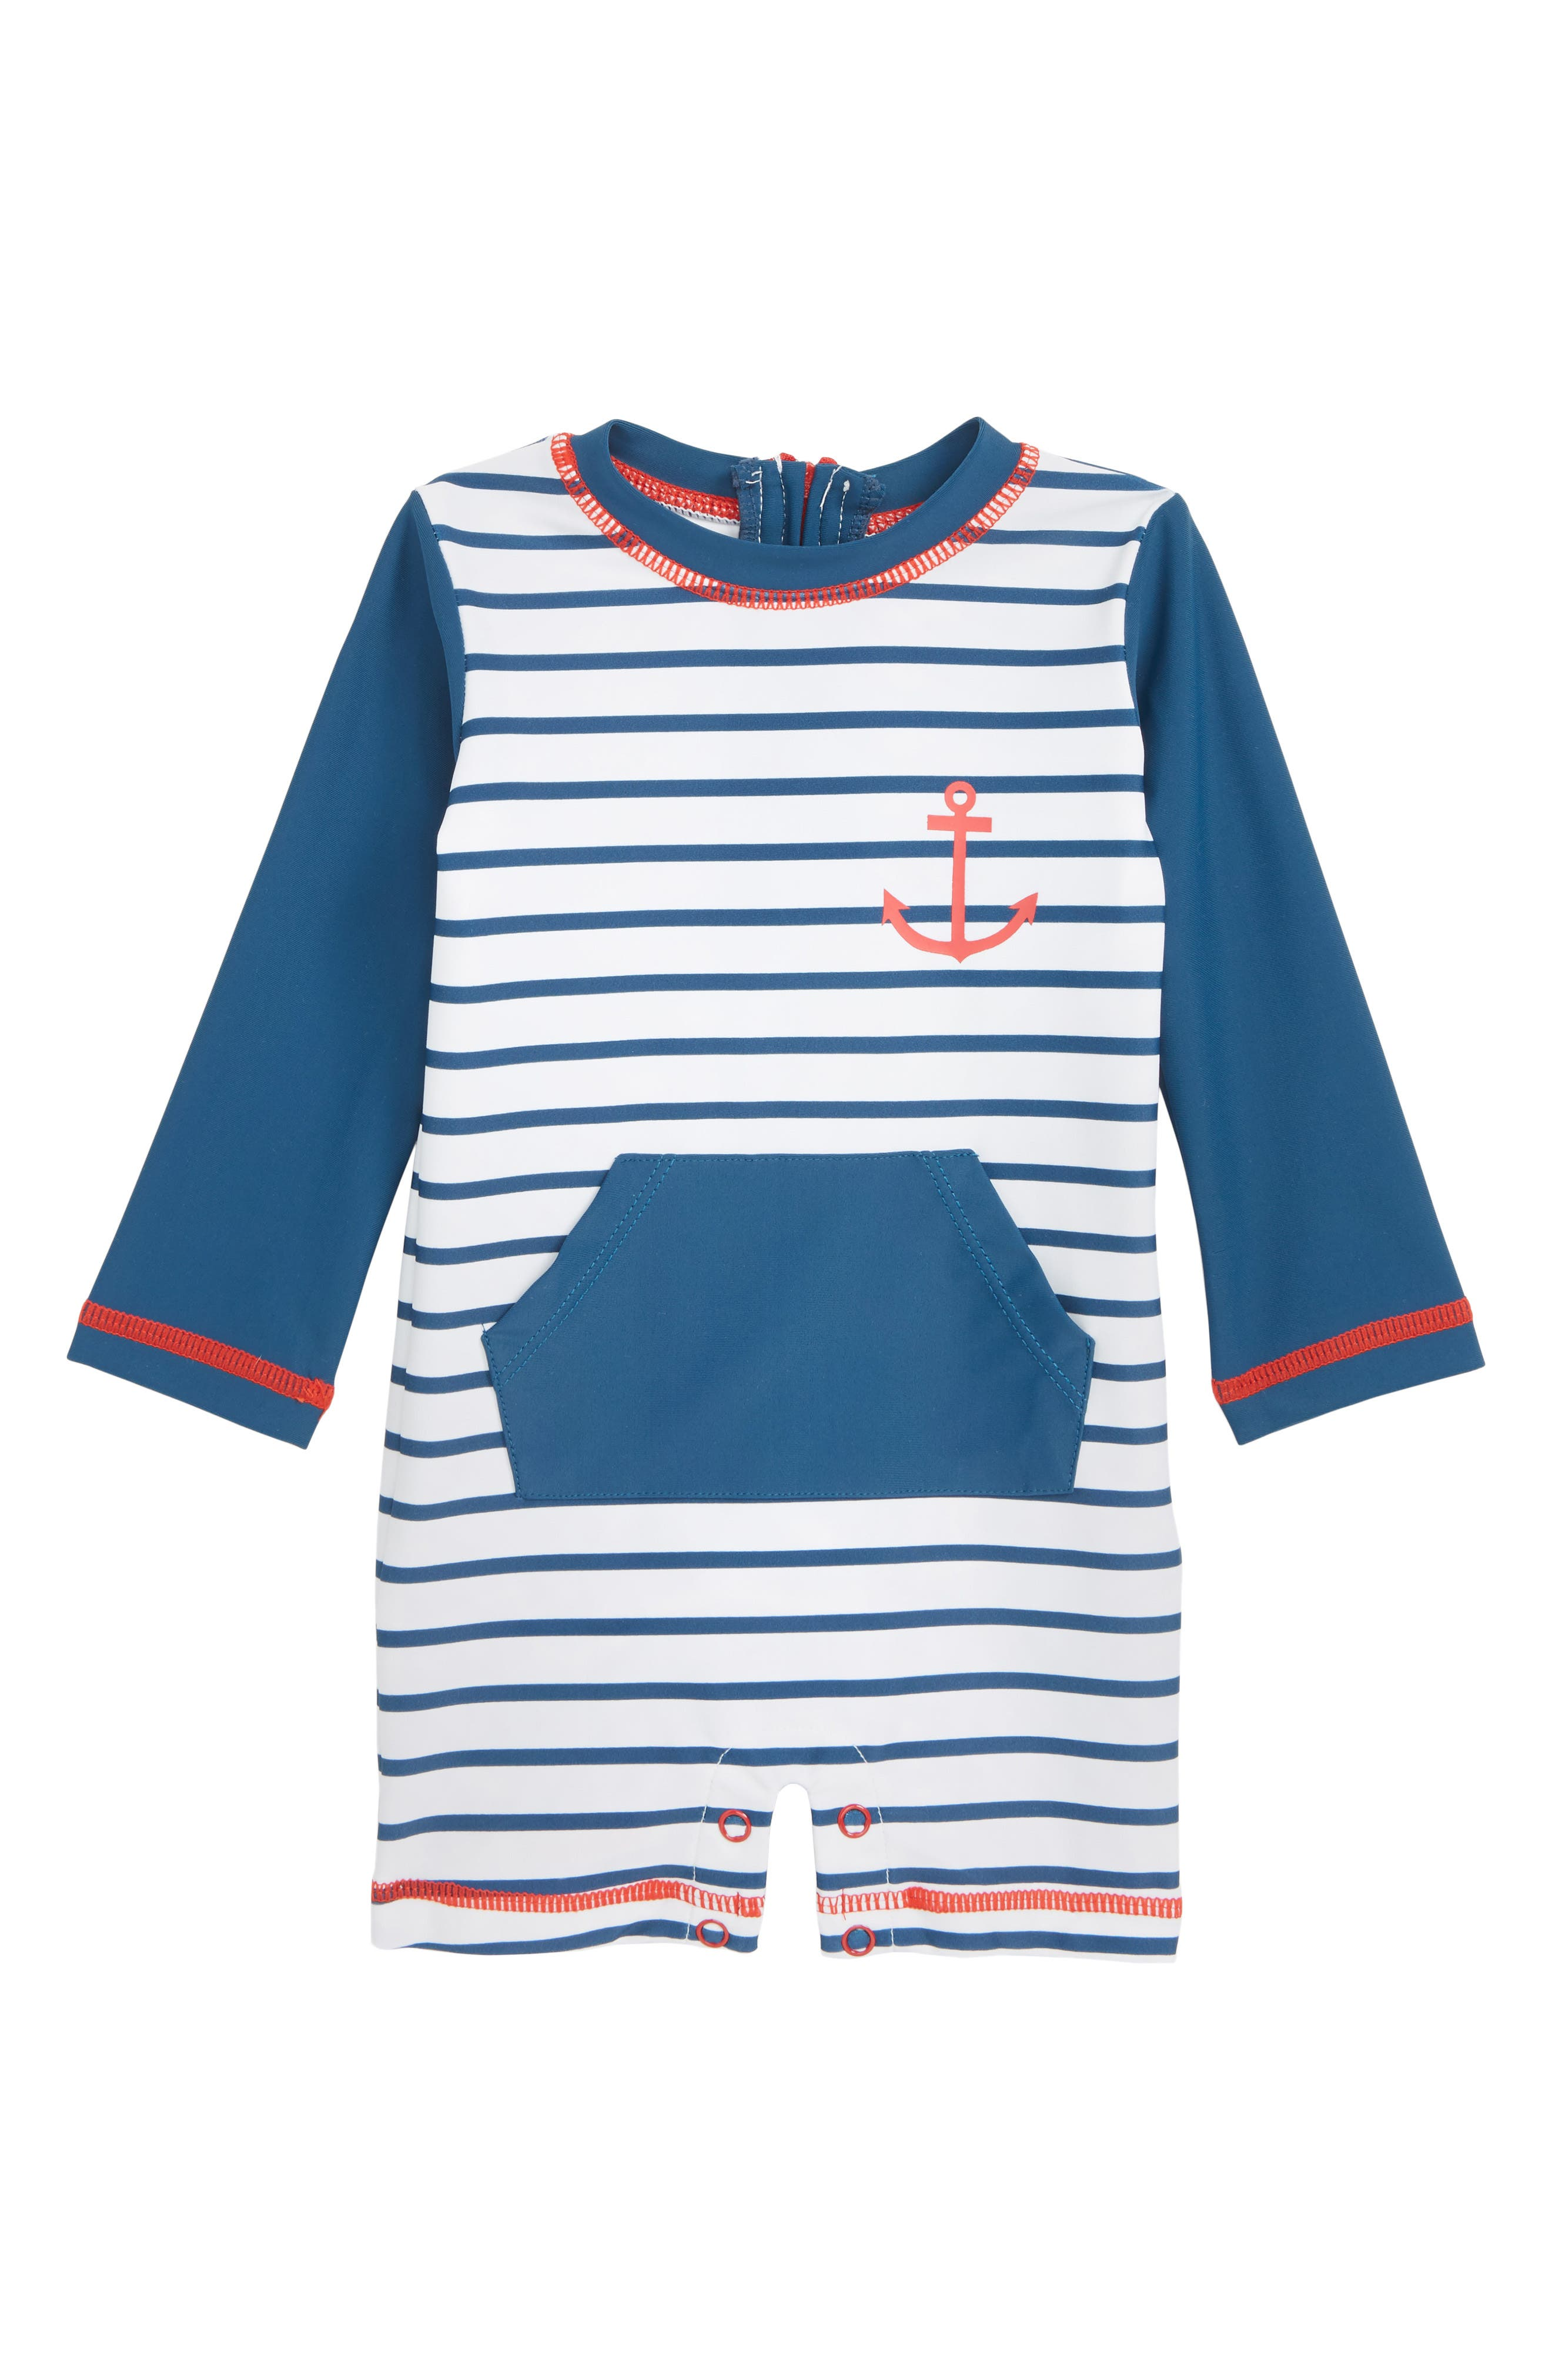 Nautical Stripes One-Piece Rashguard Swimsuit, Main, color, WHITE